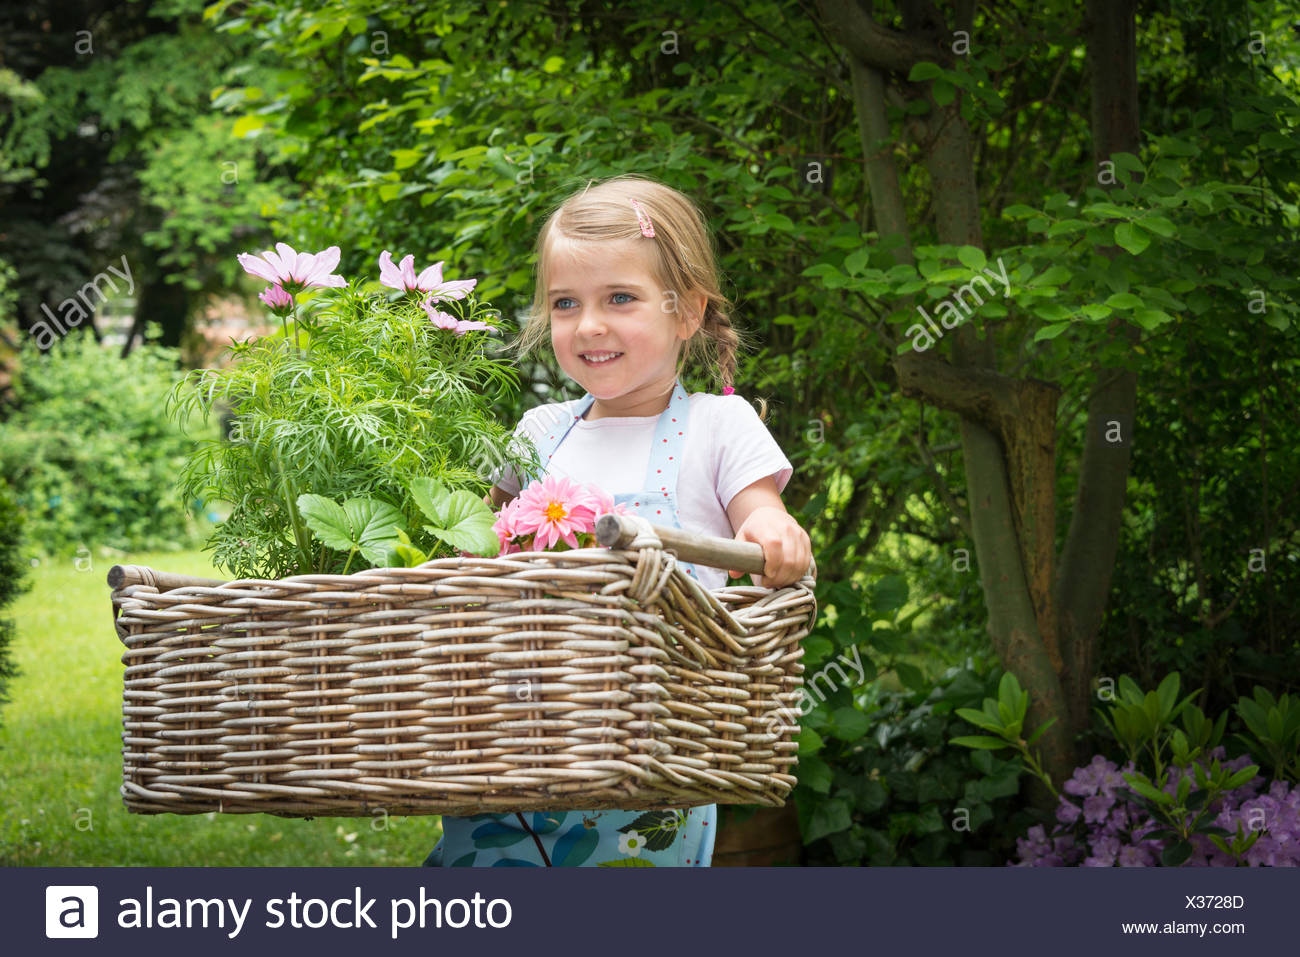 Girl gardening, carrying flowers in basket - Stock Image